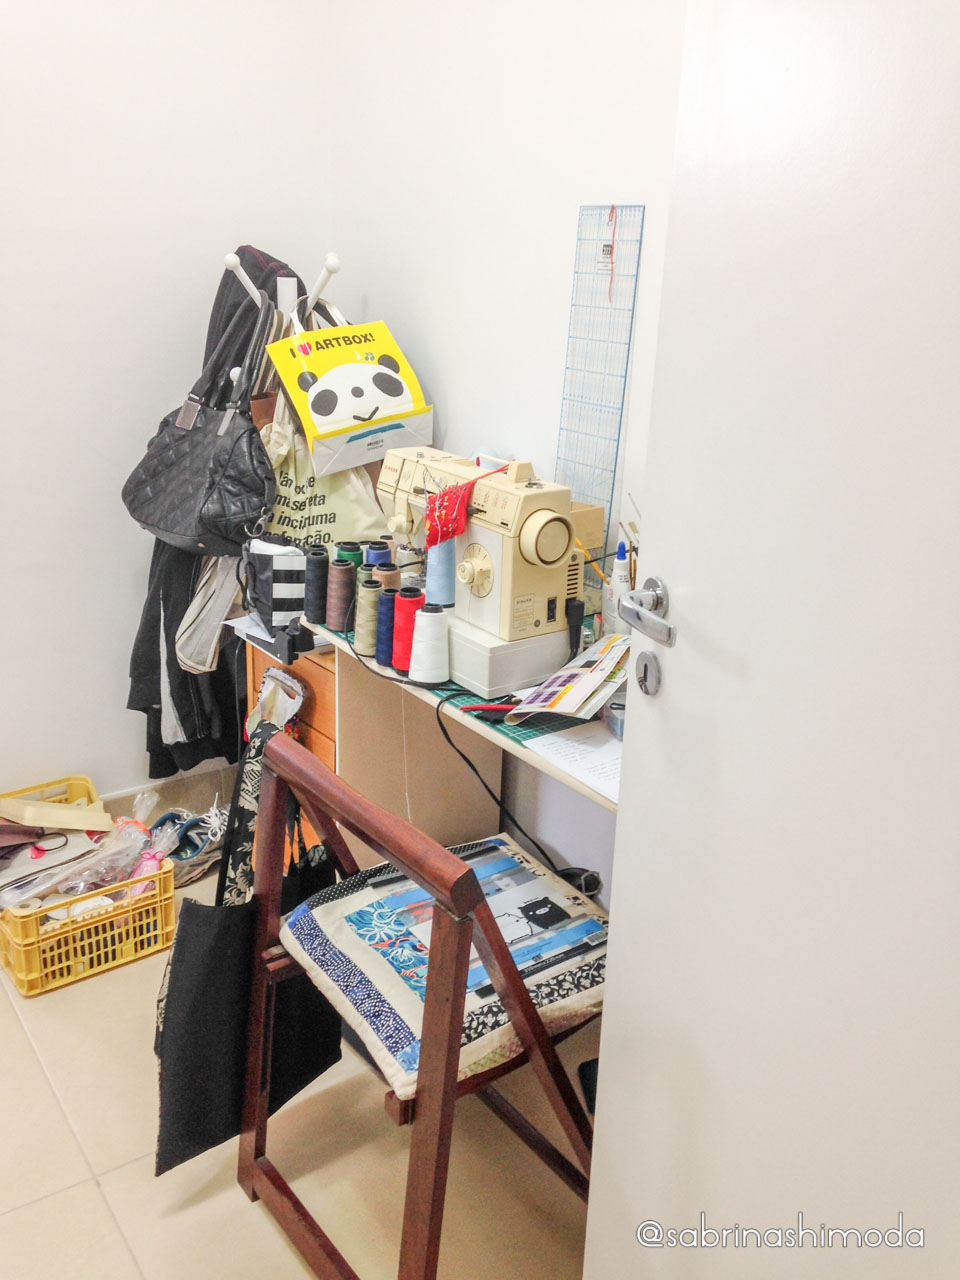 201407-RES-Atelier-Artesanato-002